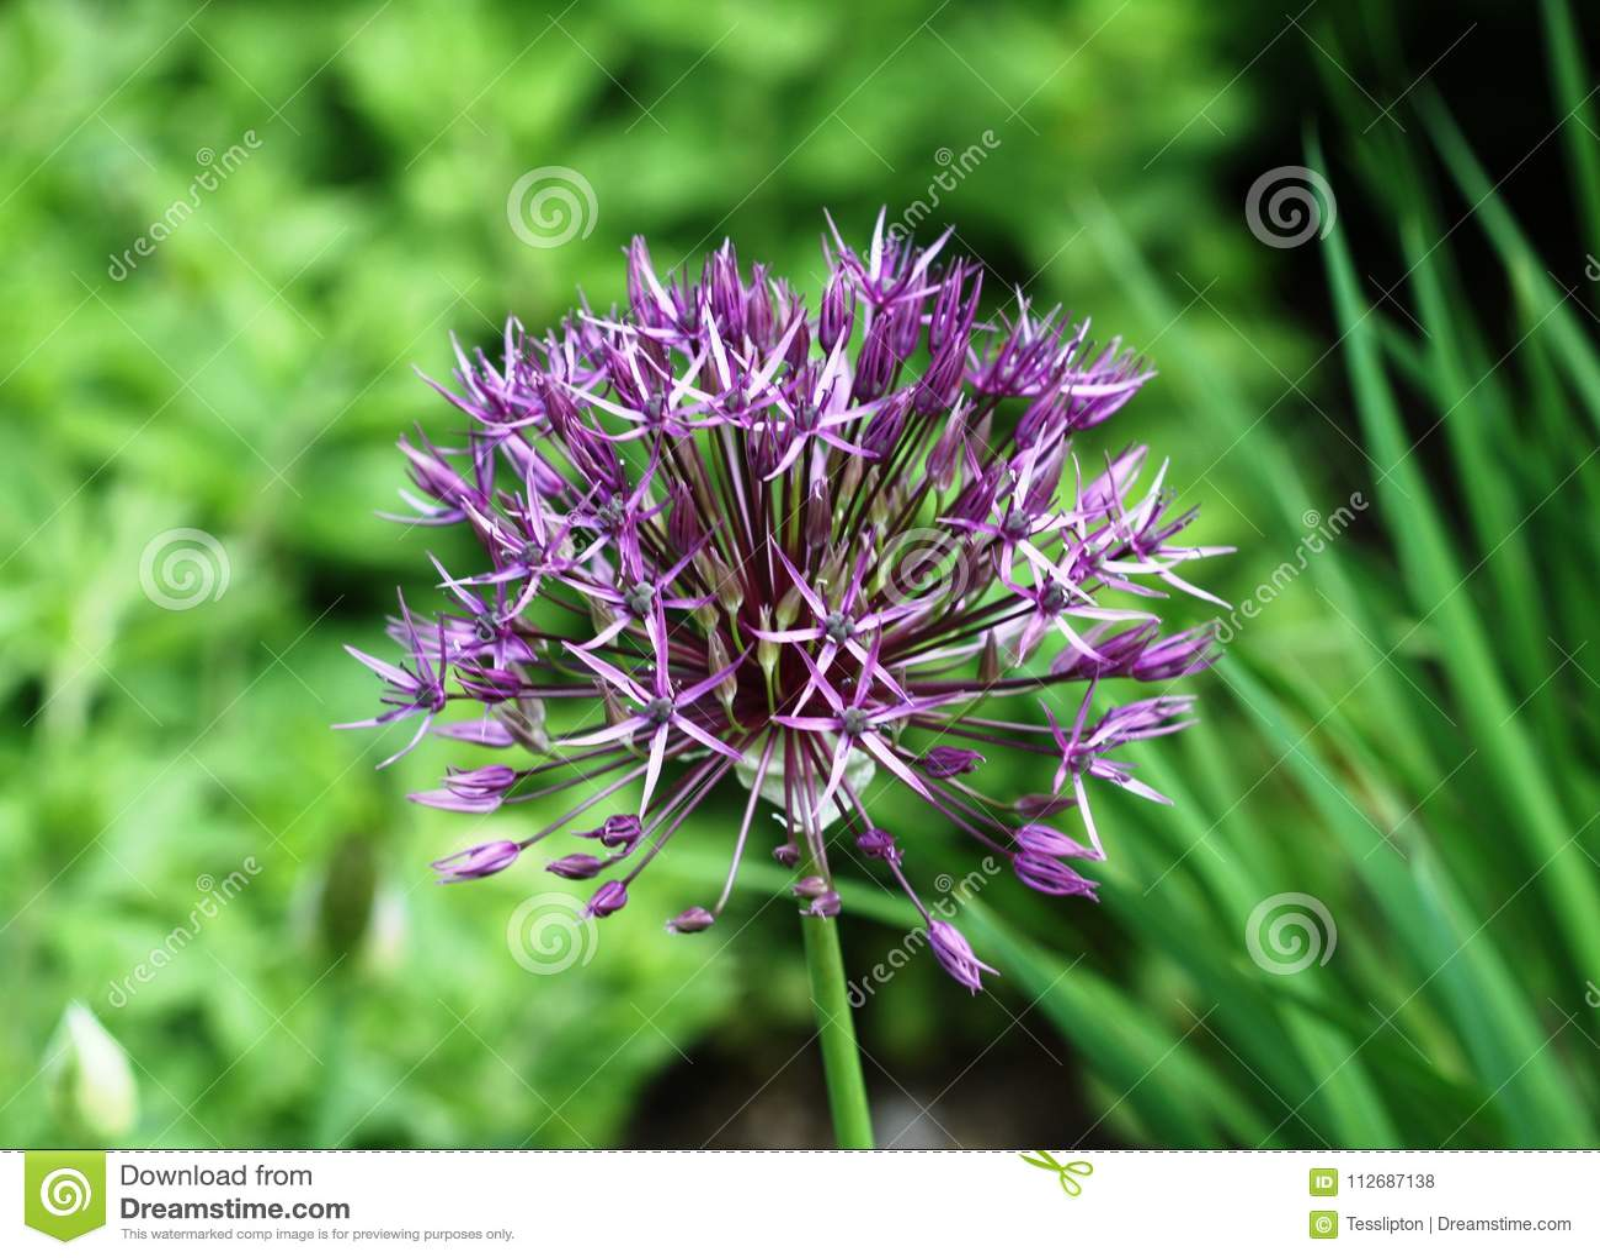 Close Up Purple Allium Flower Stock Photo Image Of Bulb Flowers